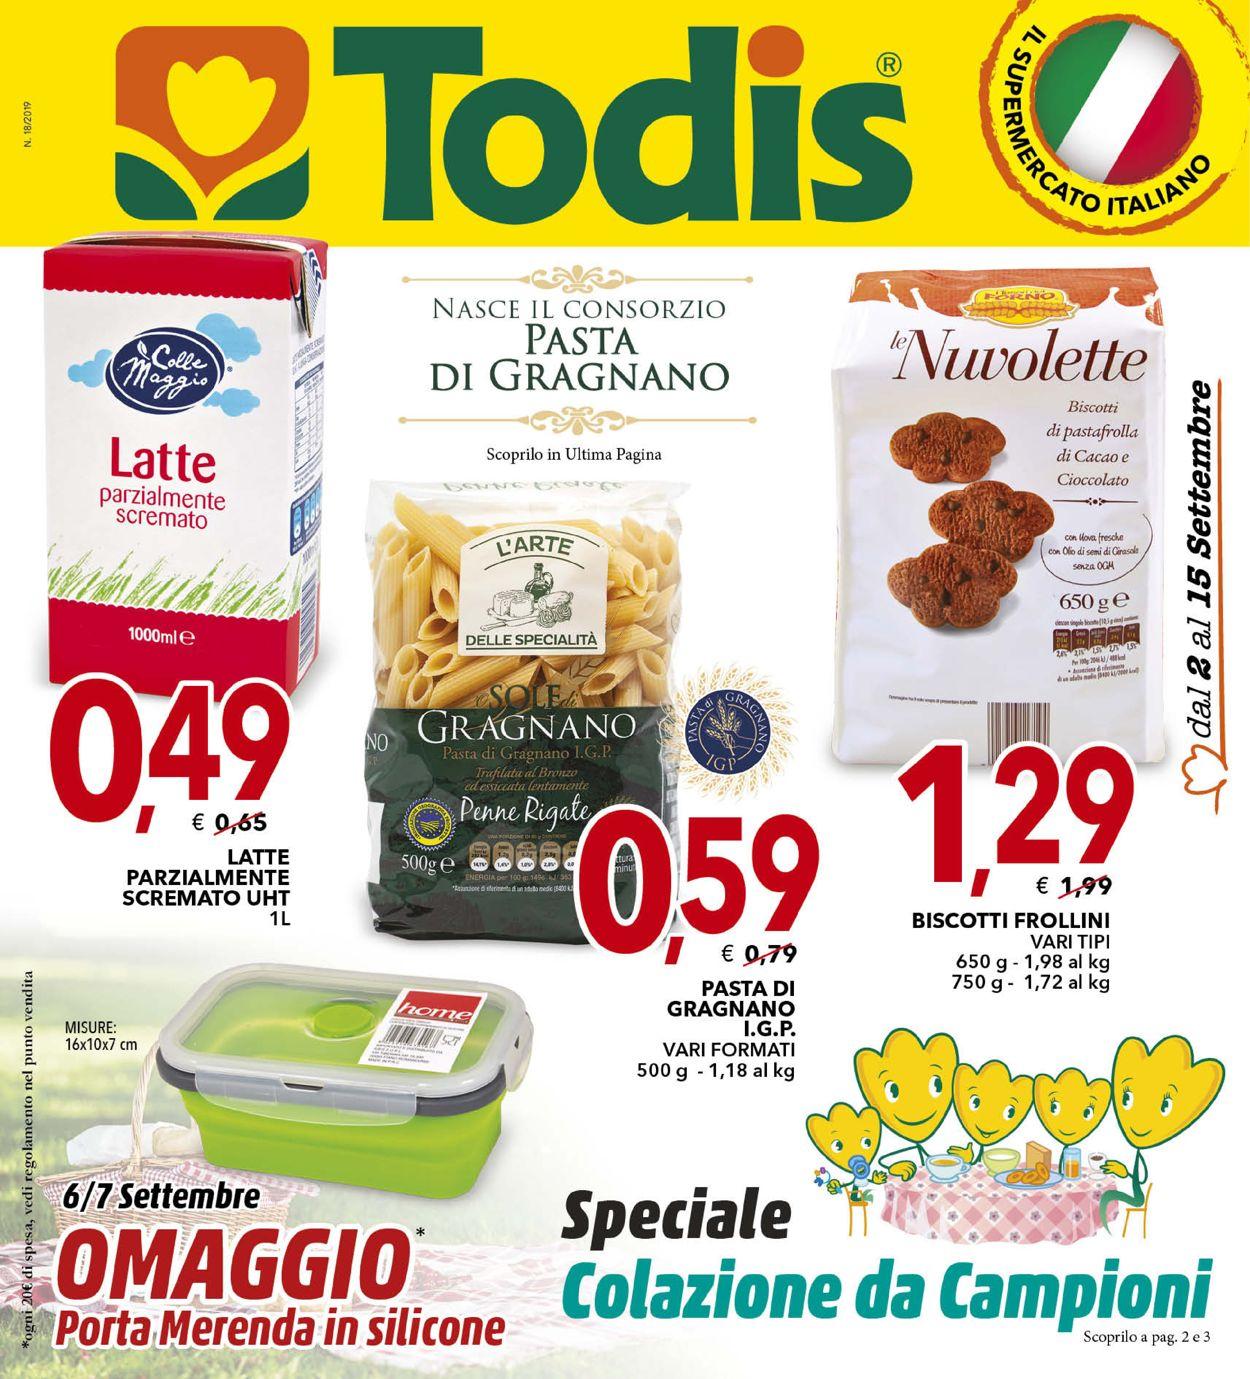 Volantino Todis - Offerte 02/09-15/09/2019